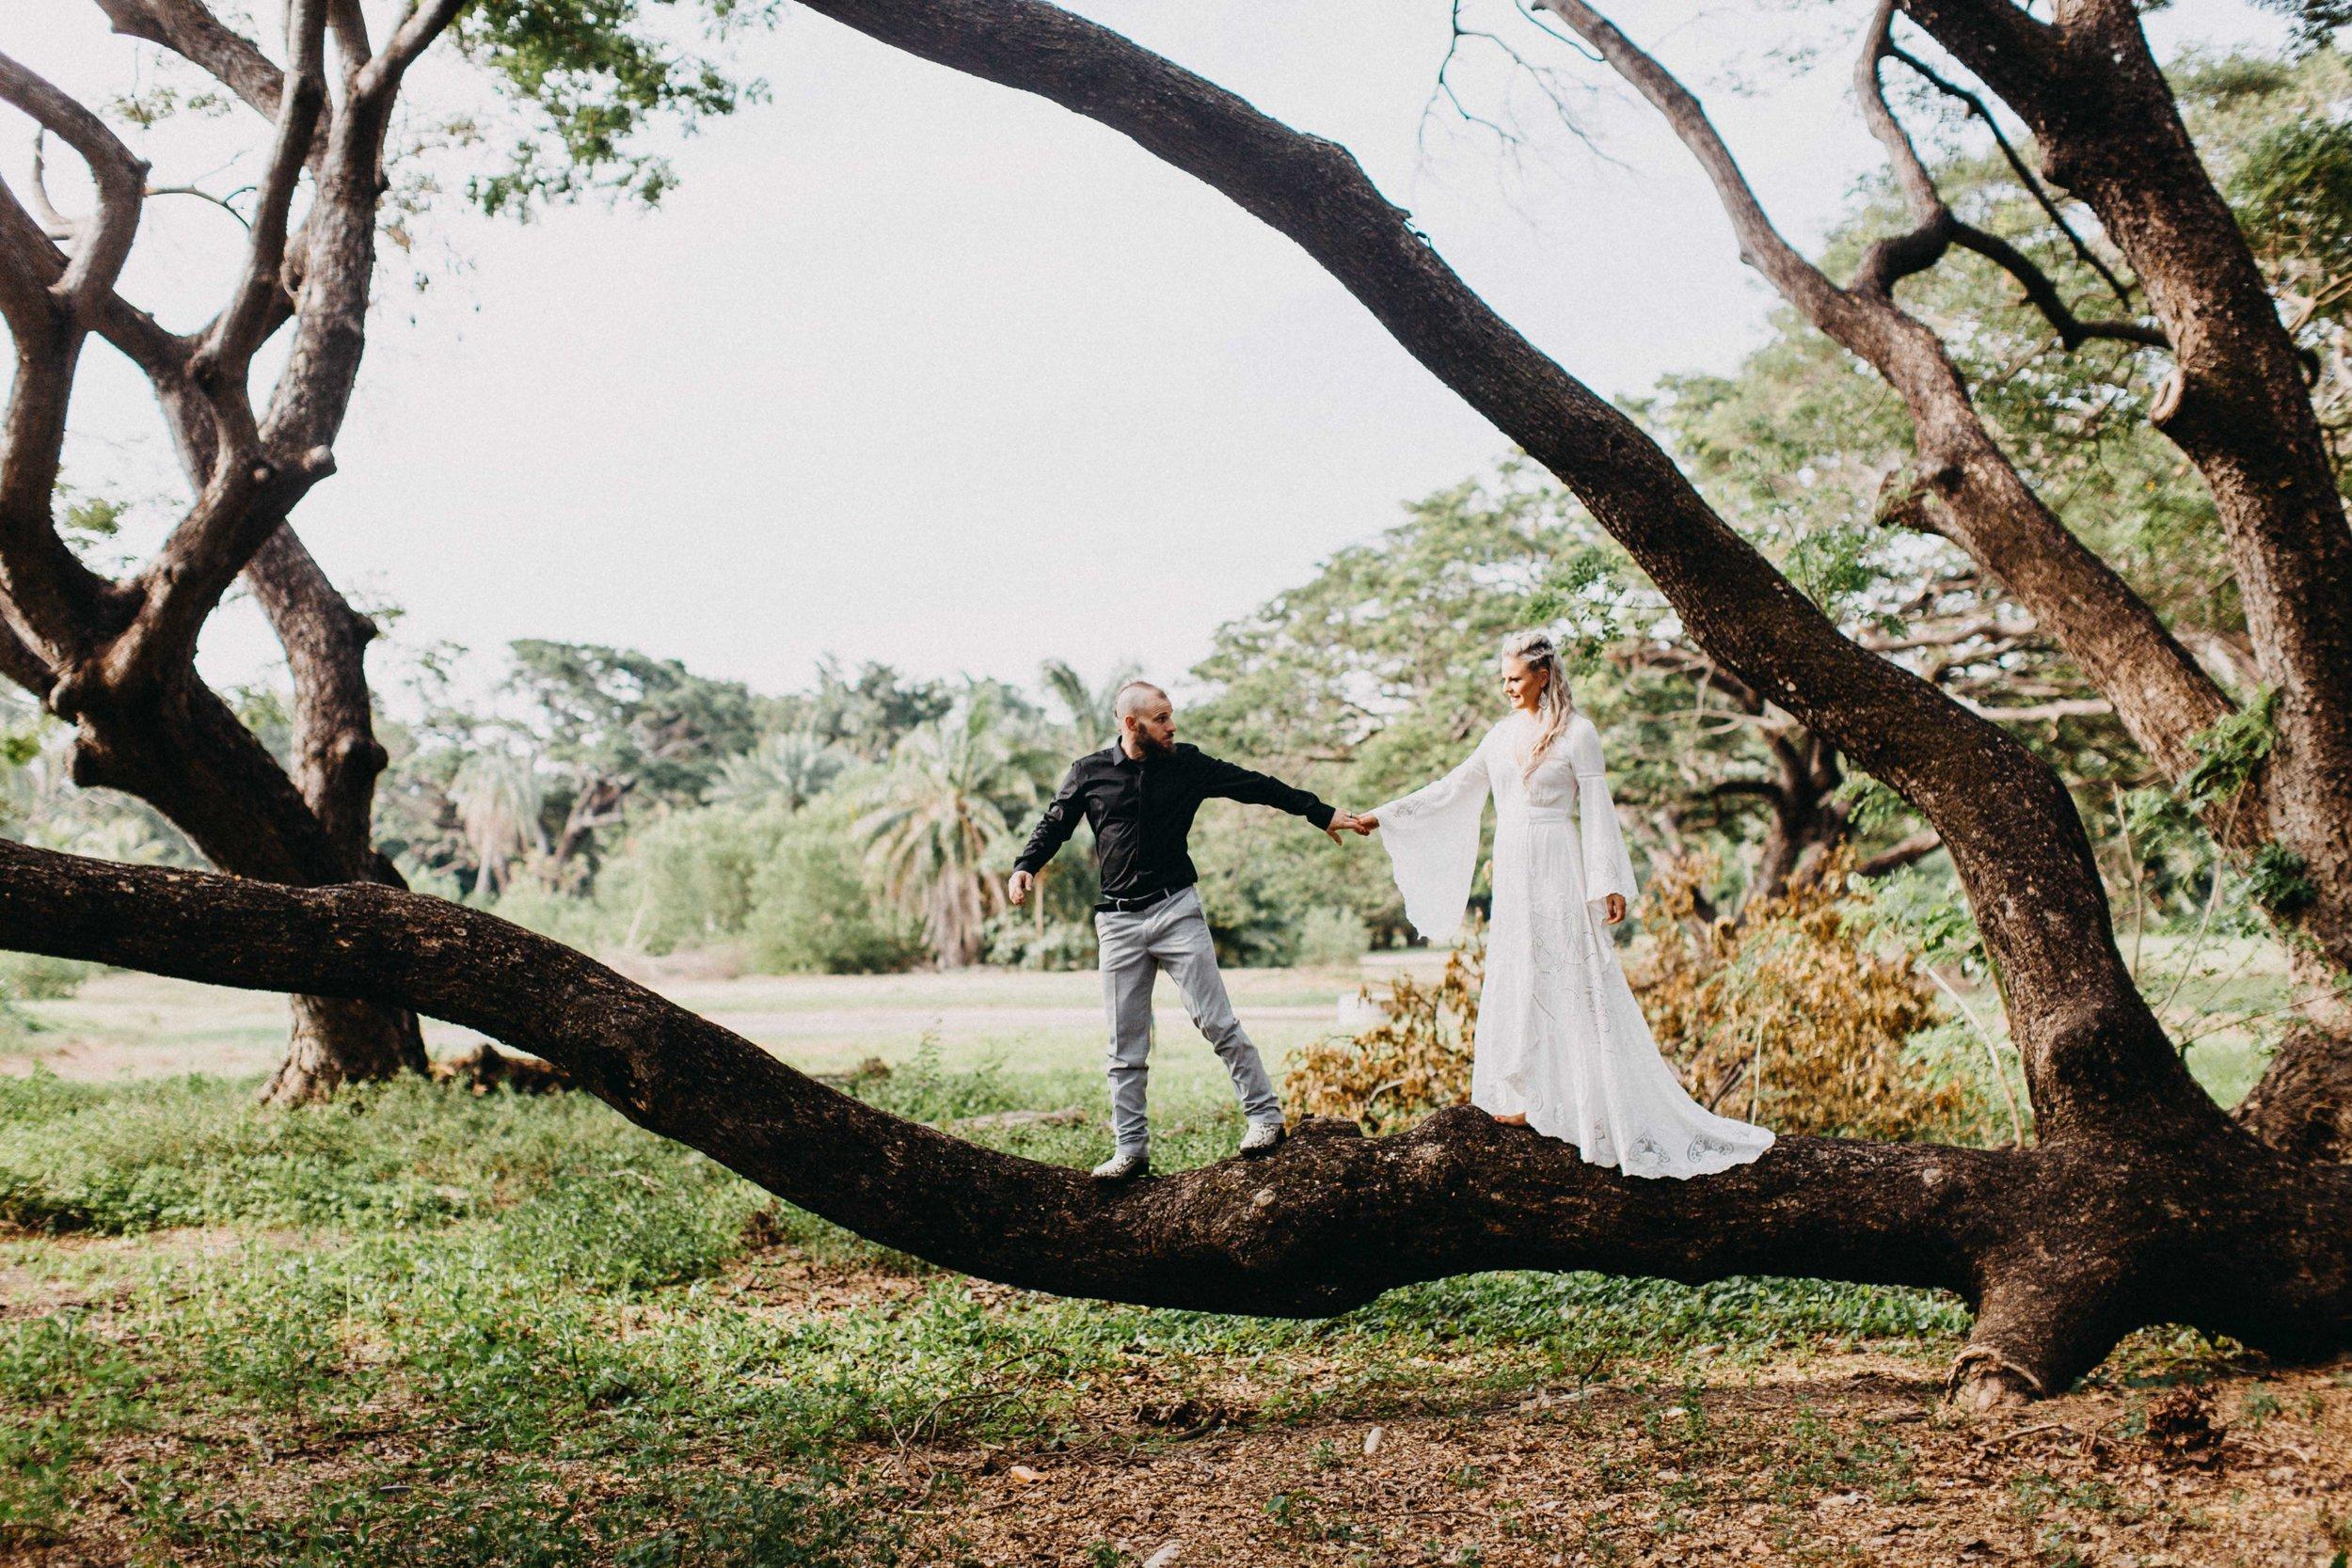 darwin-elopement-wedding-beach-camden-photography-www.emilyobrienphotography.net-35.jpg